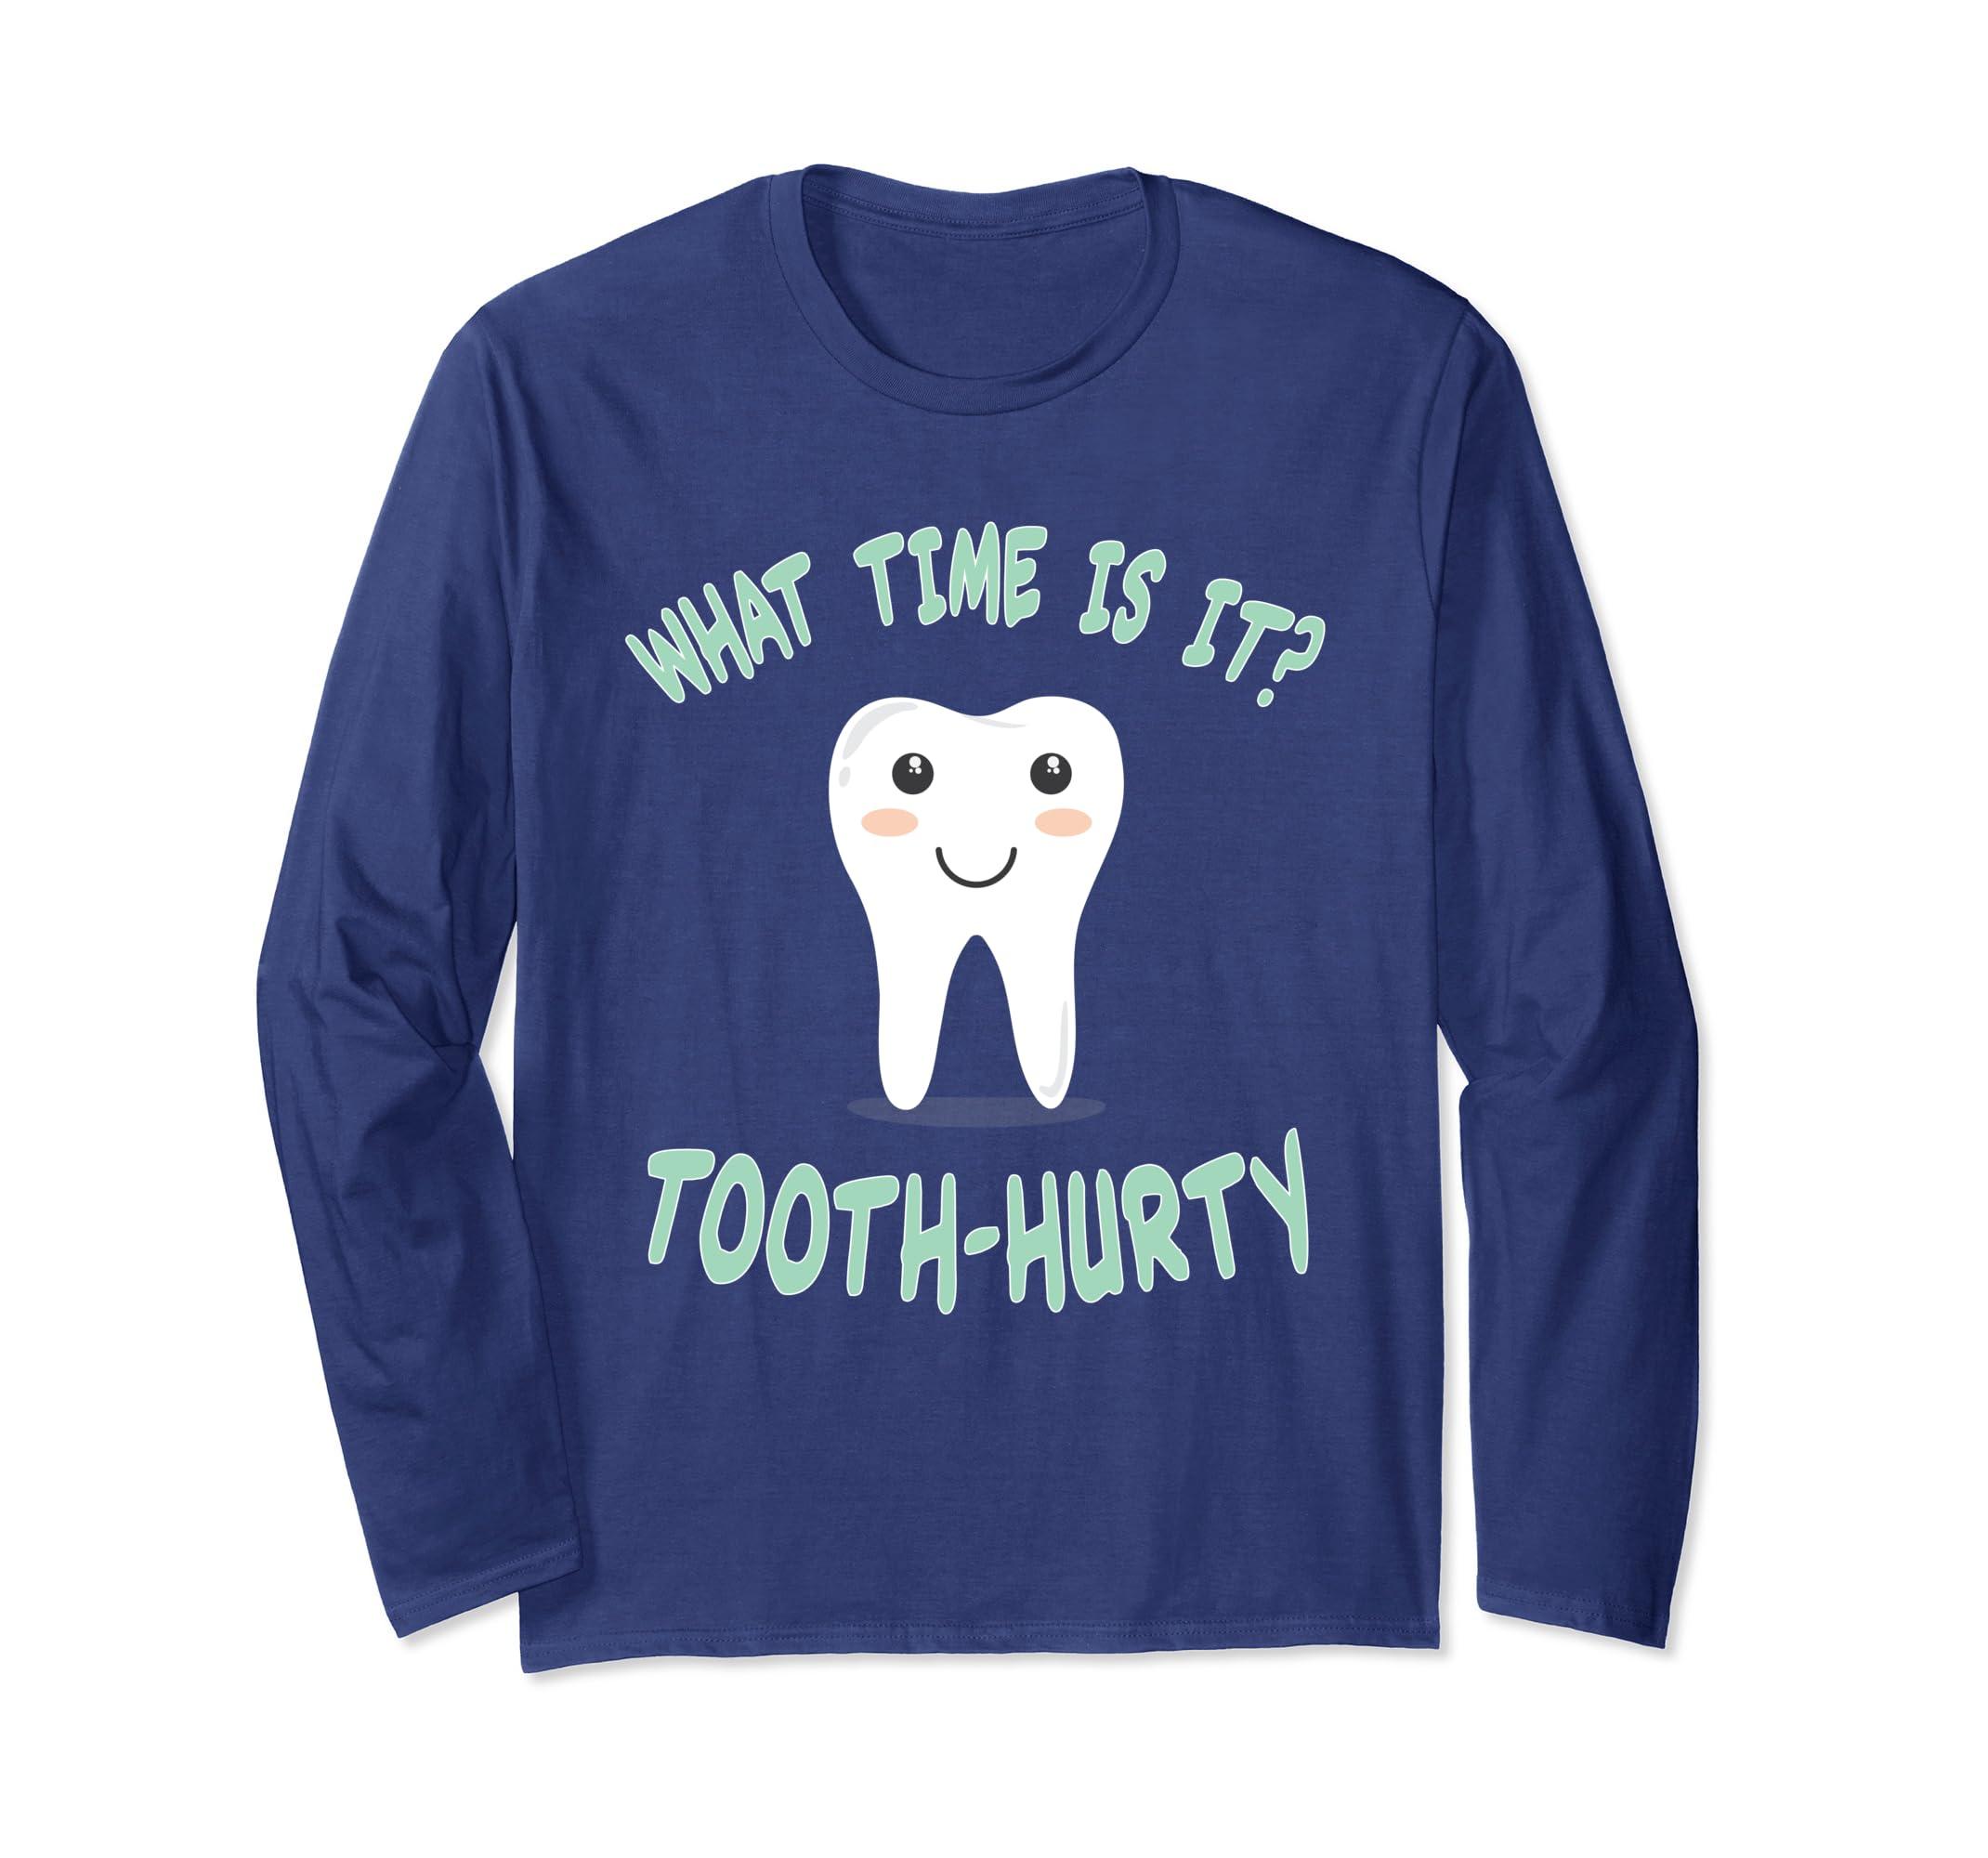 735d9023d9 Amazon.com: Funny Dental / Dentist Pun Joke & Gift - Tooth Hurty Time Long  Sleeve T-Shirt: Clothing